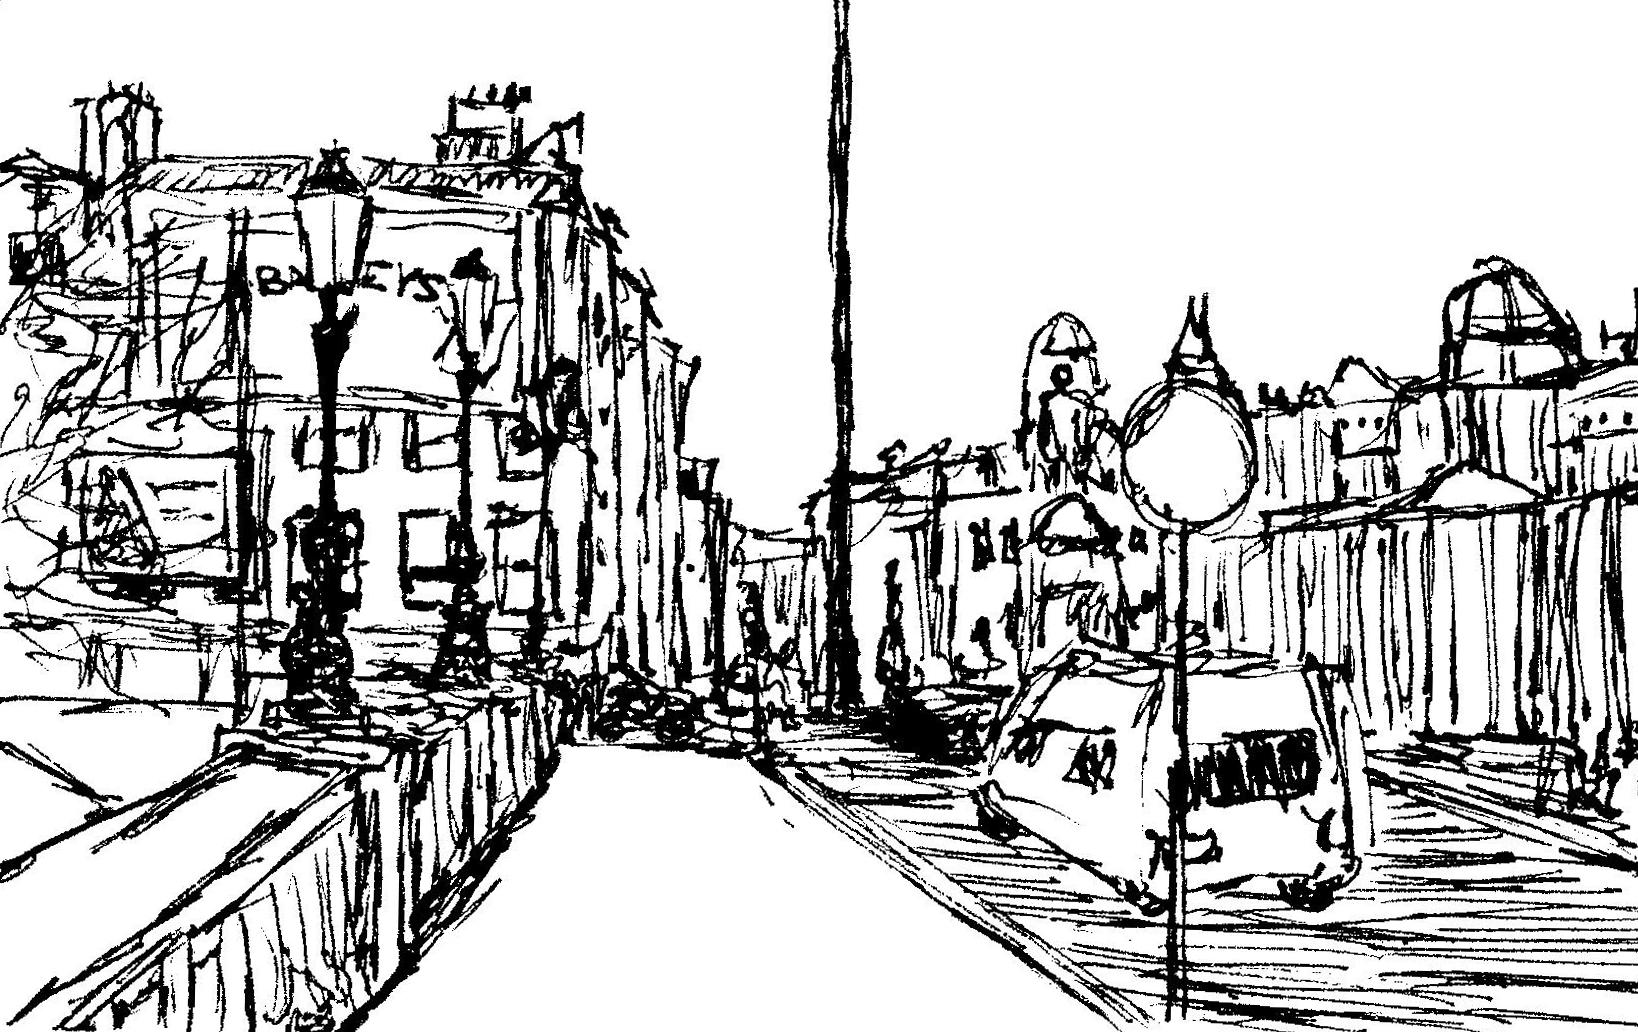 black and white line drawing Dublin, Ireland by Katie Jurkiewicz